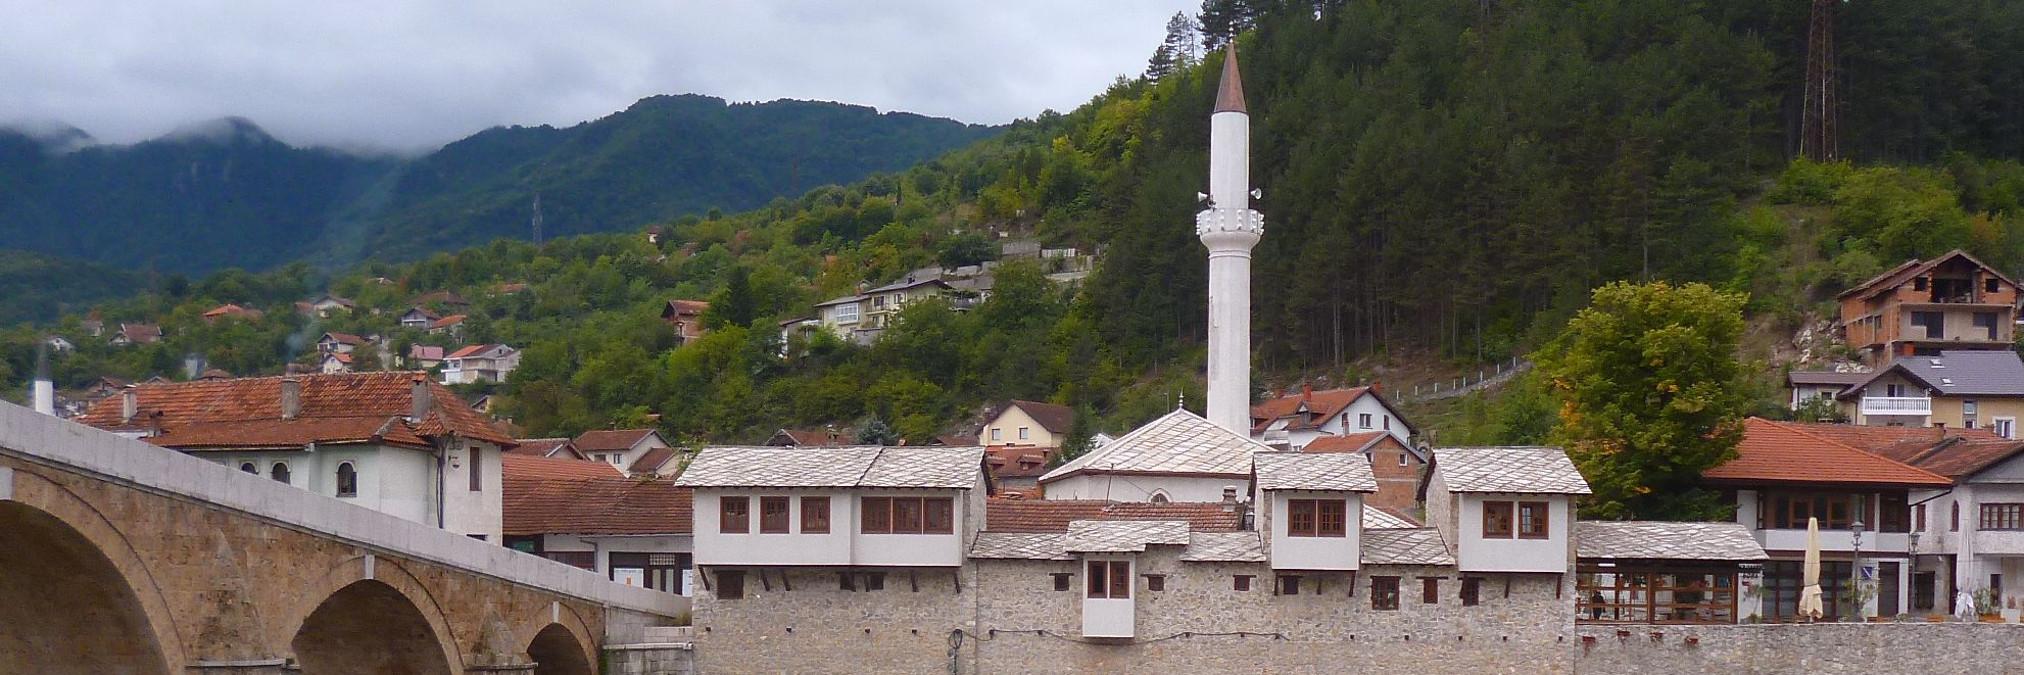 Чаршийская мечеть. Фото: Елена Арсениевич, CC BY-SA 3.0